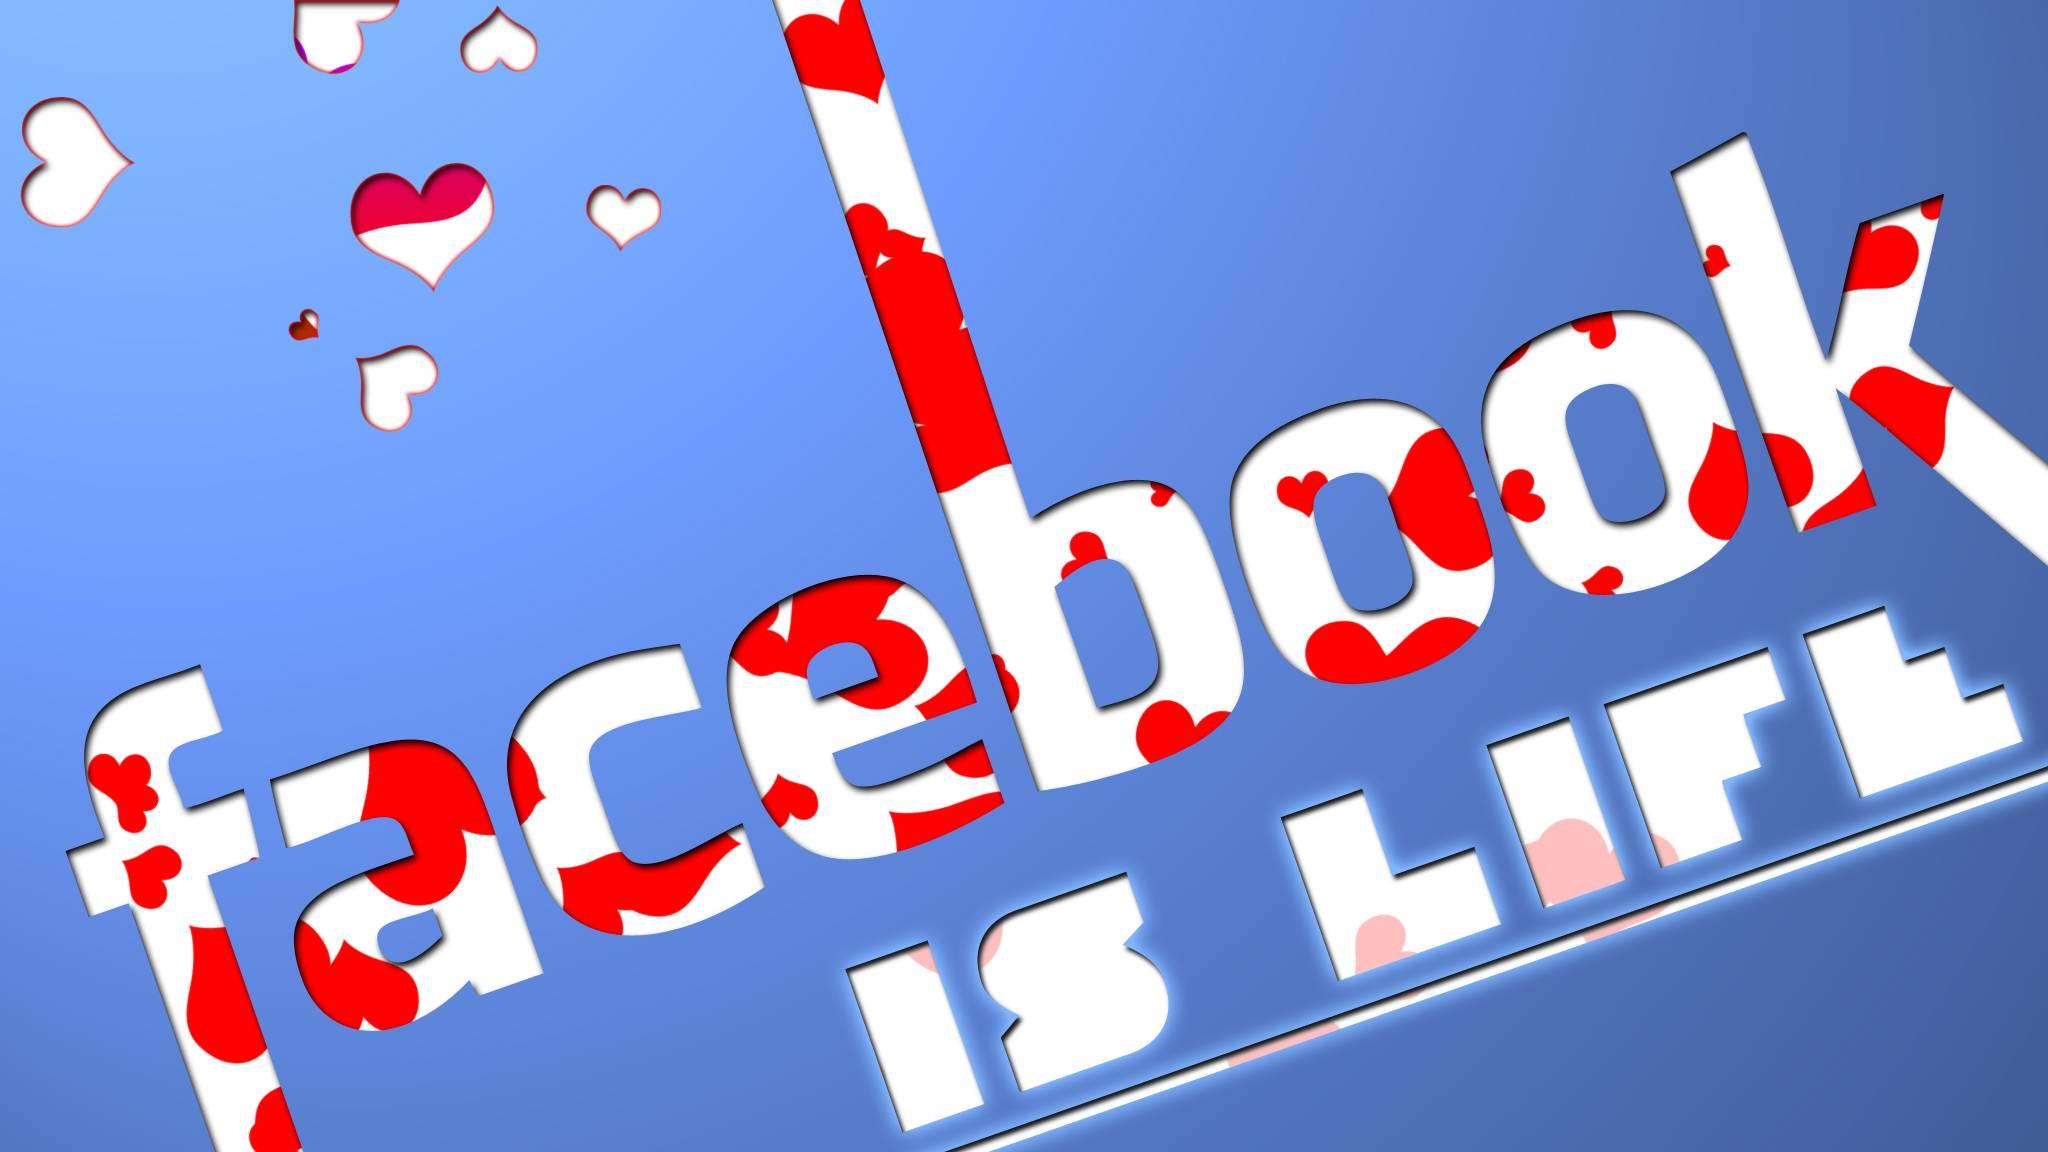 Free Download Great Fb Wallpaper Facebook Wallpaper